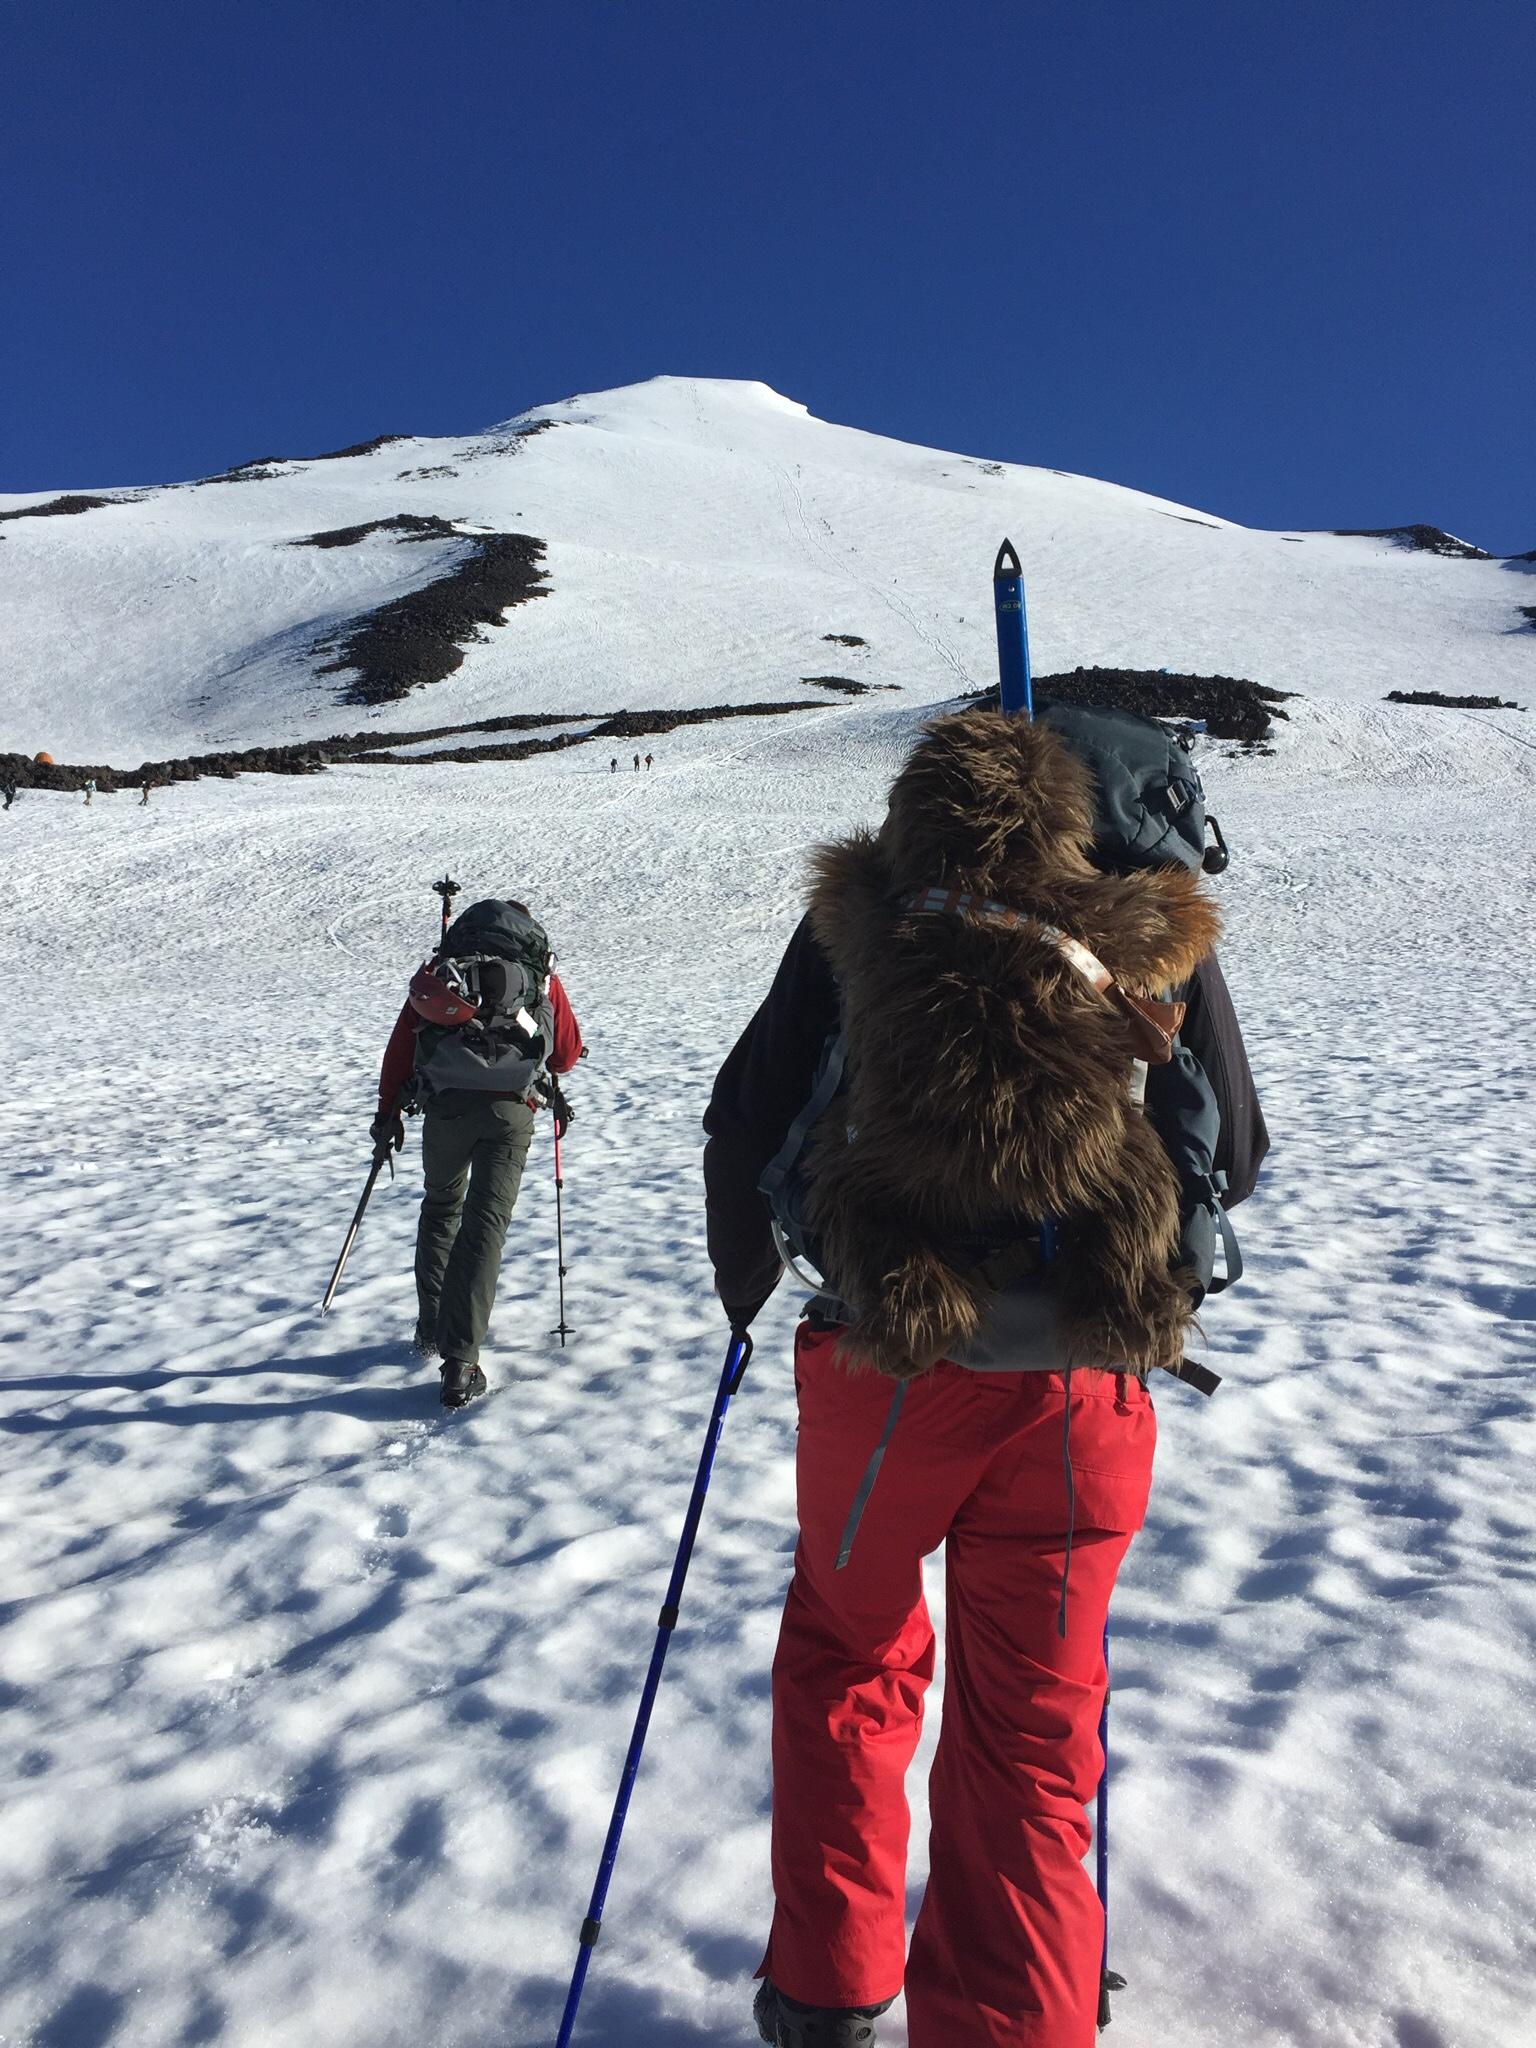 Wookie Summits Mt Adams